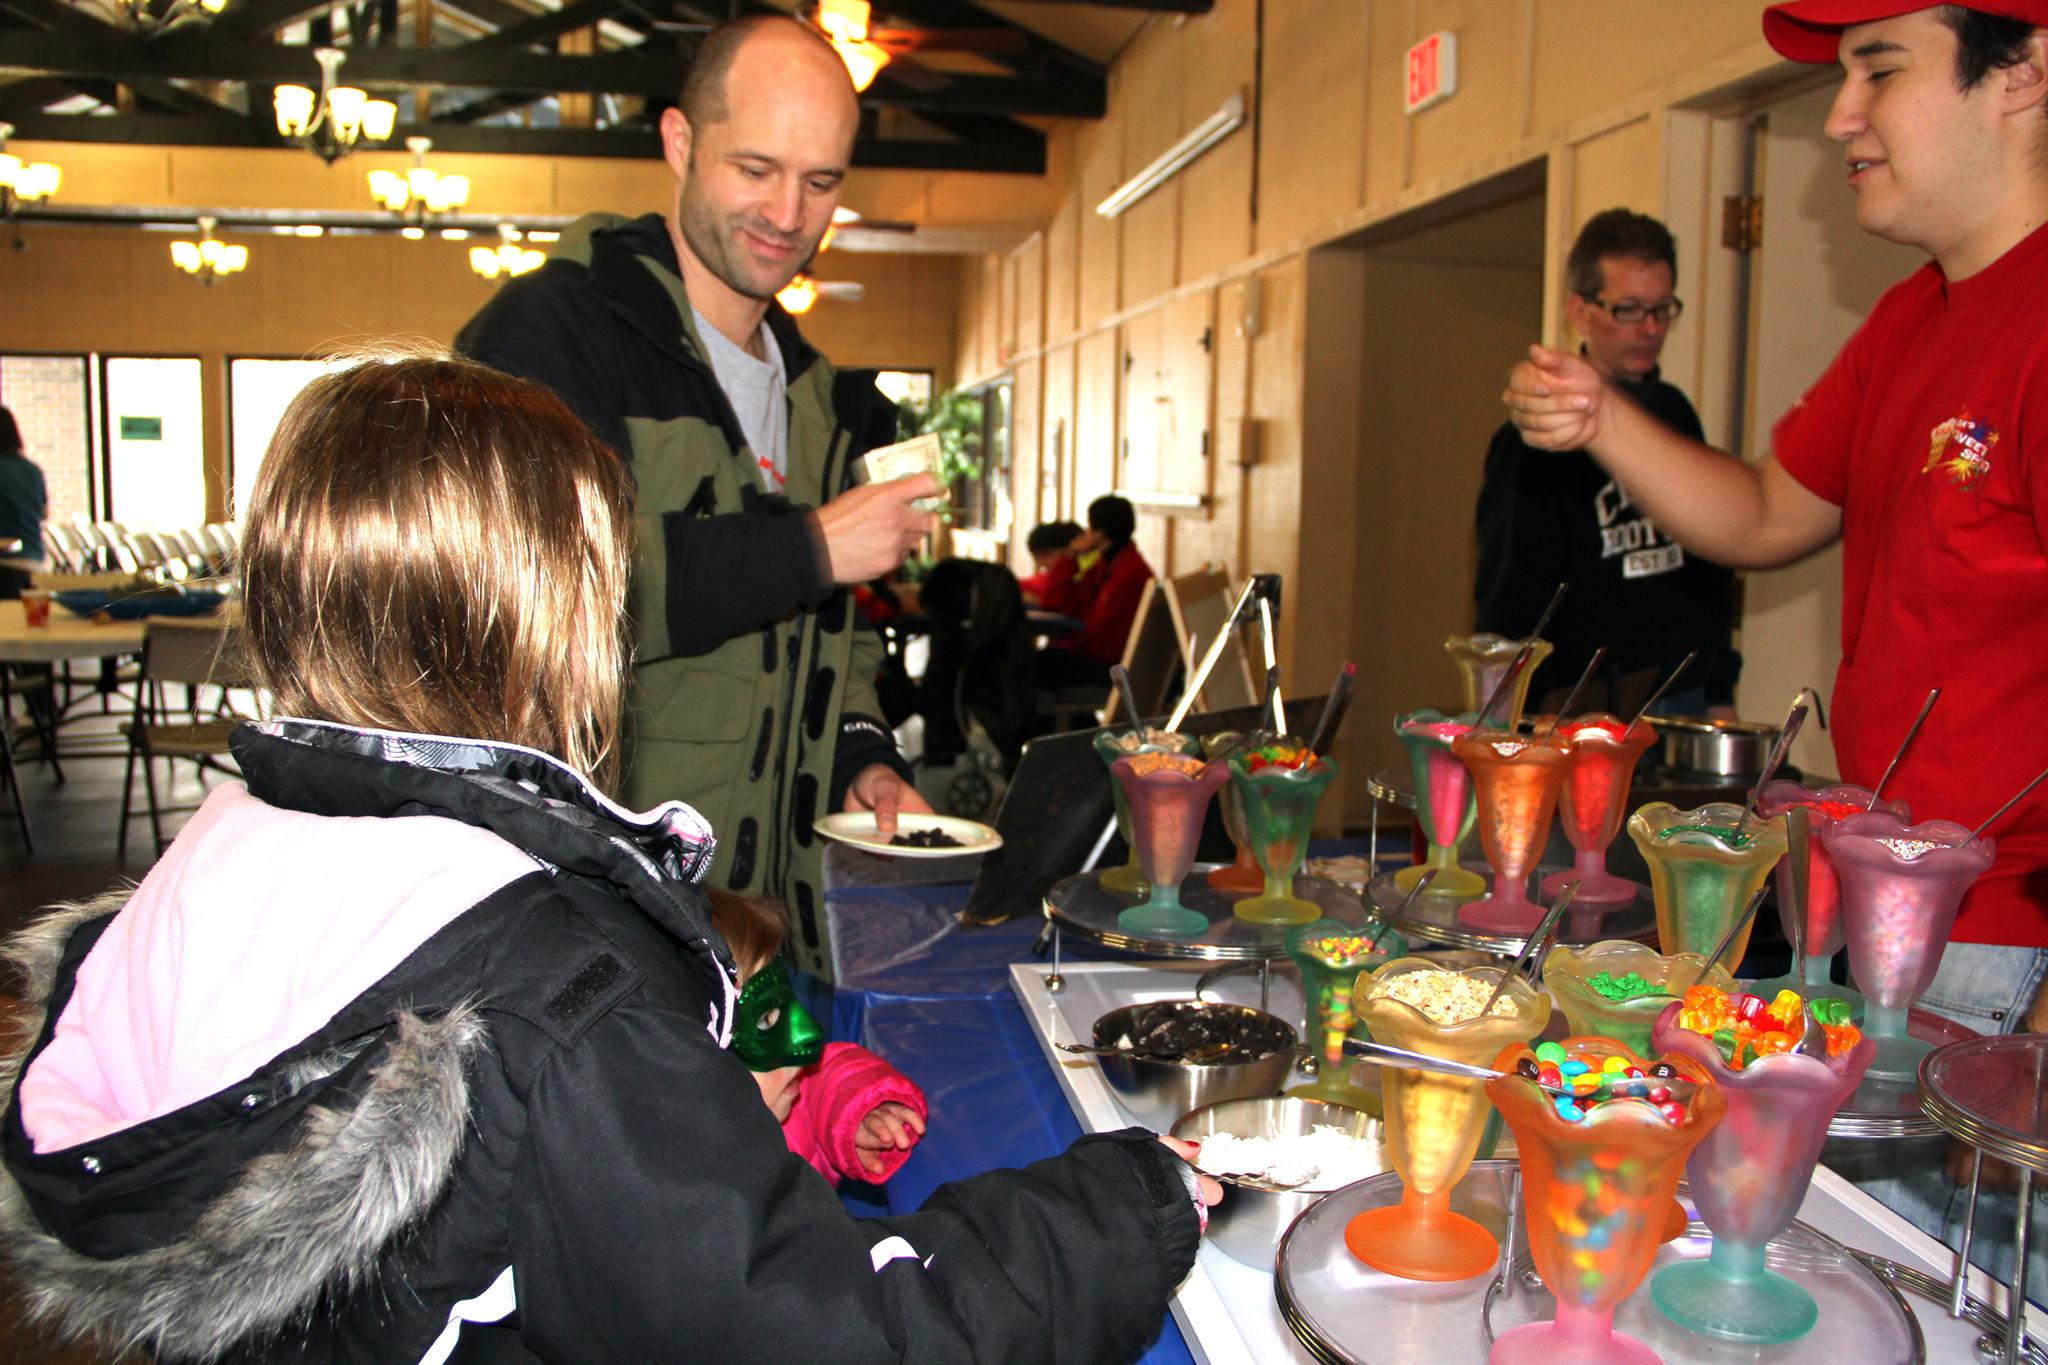 Oak brook community celebrates 51st winterfest the for Table 52 oak brook